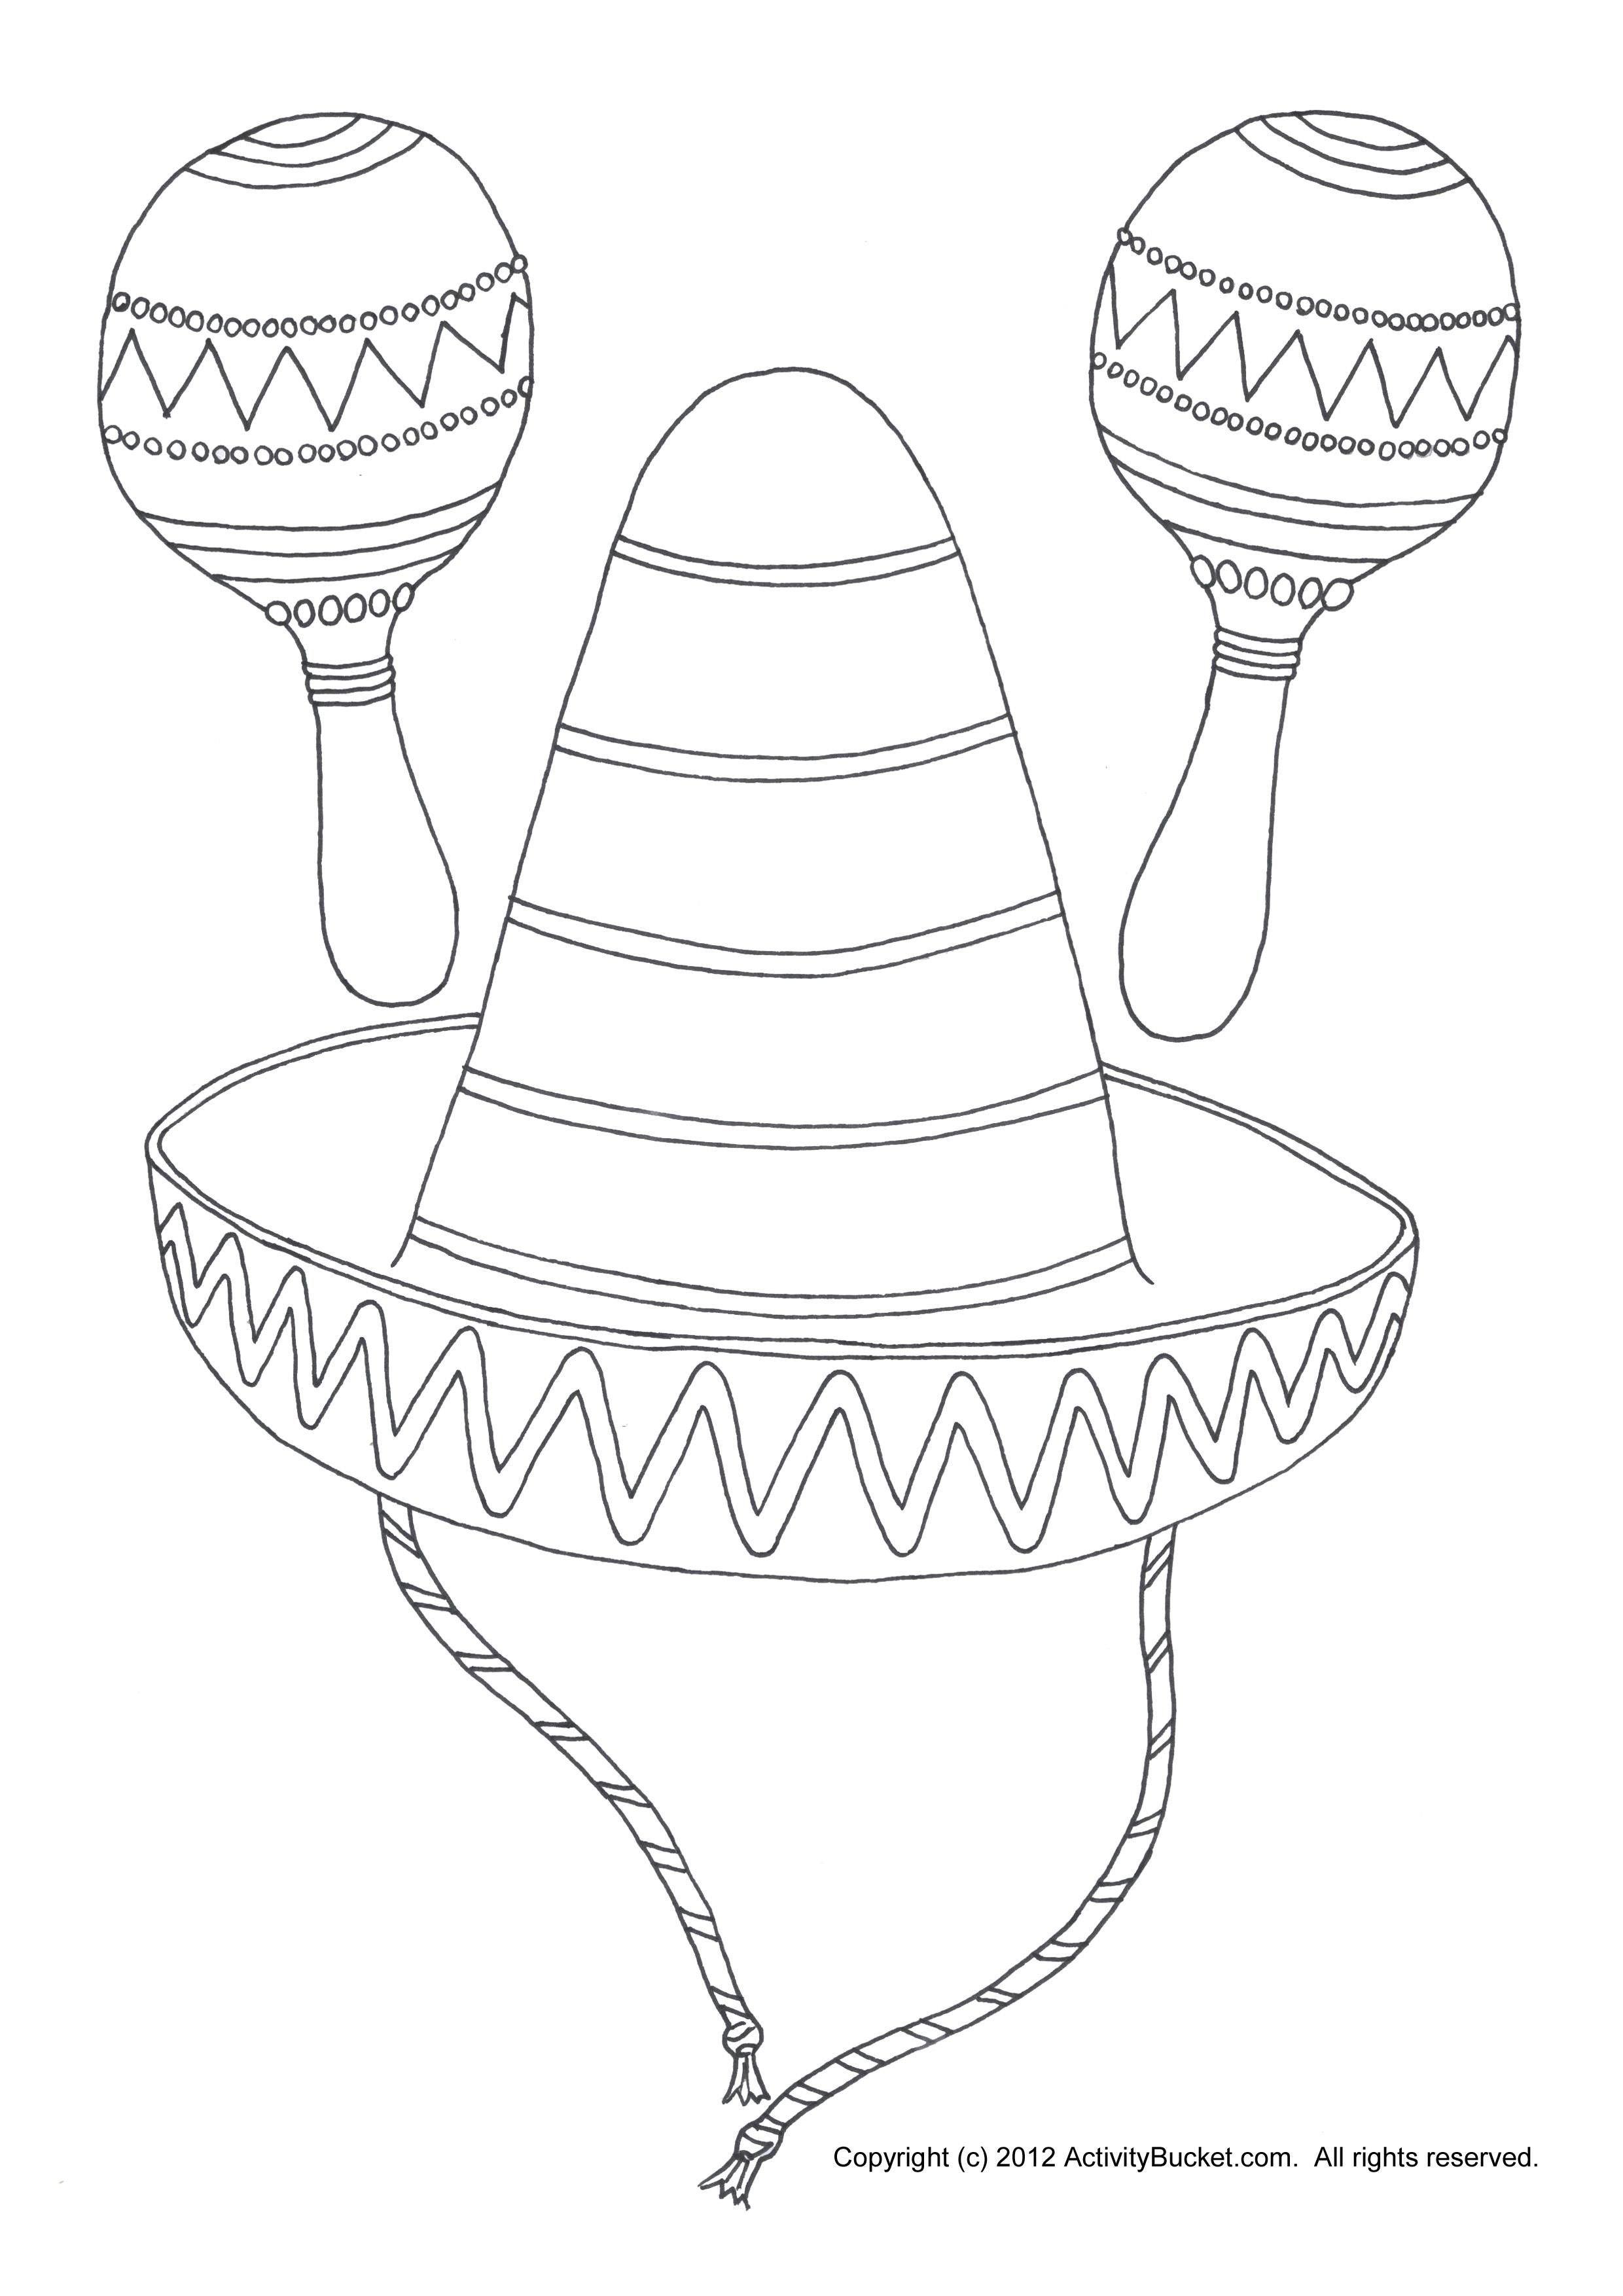 Maracas Drawing At Getdrawings